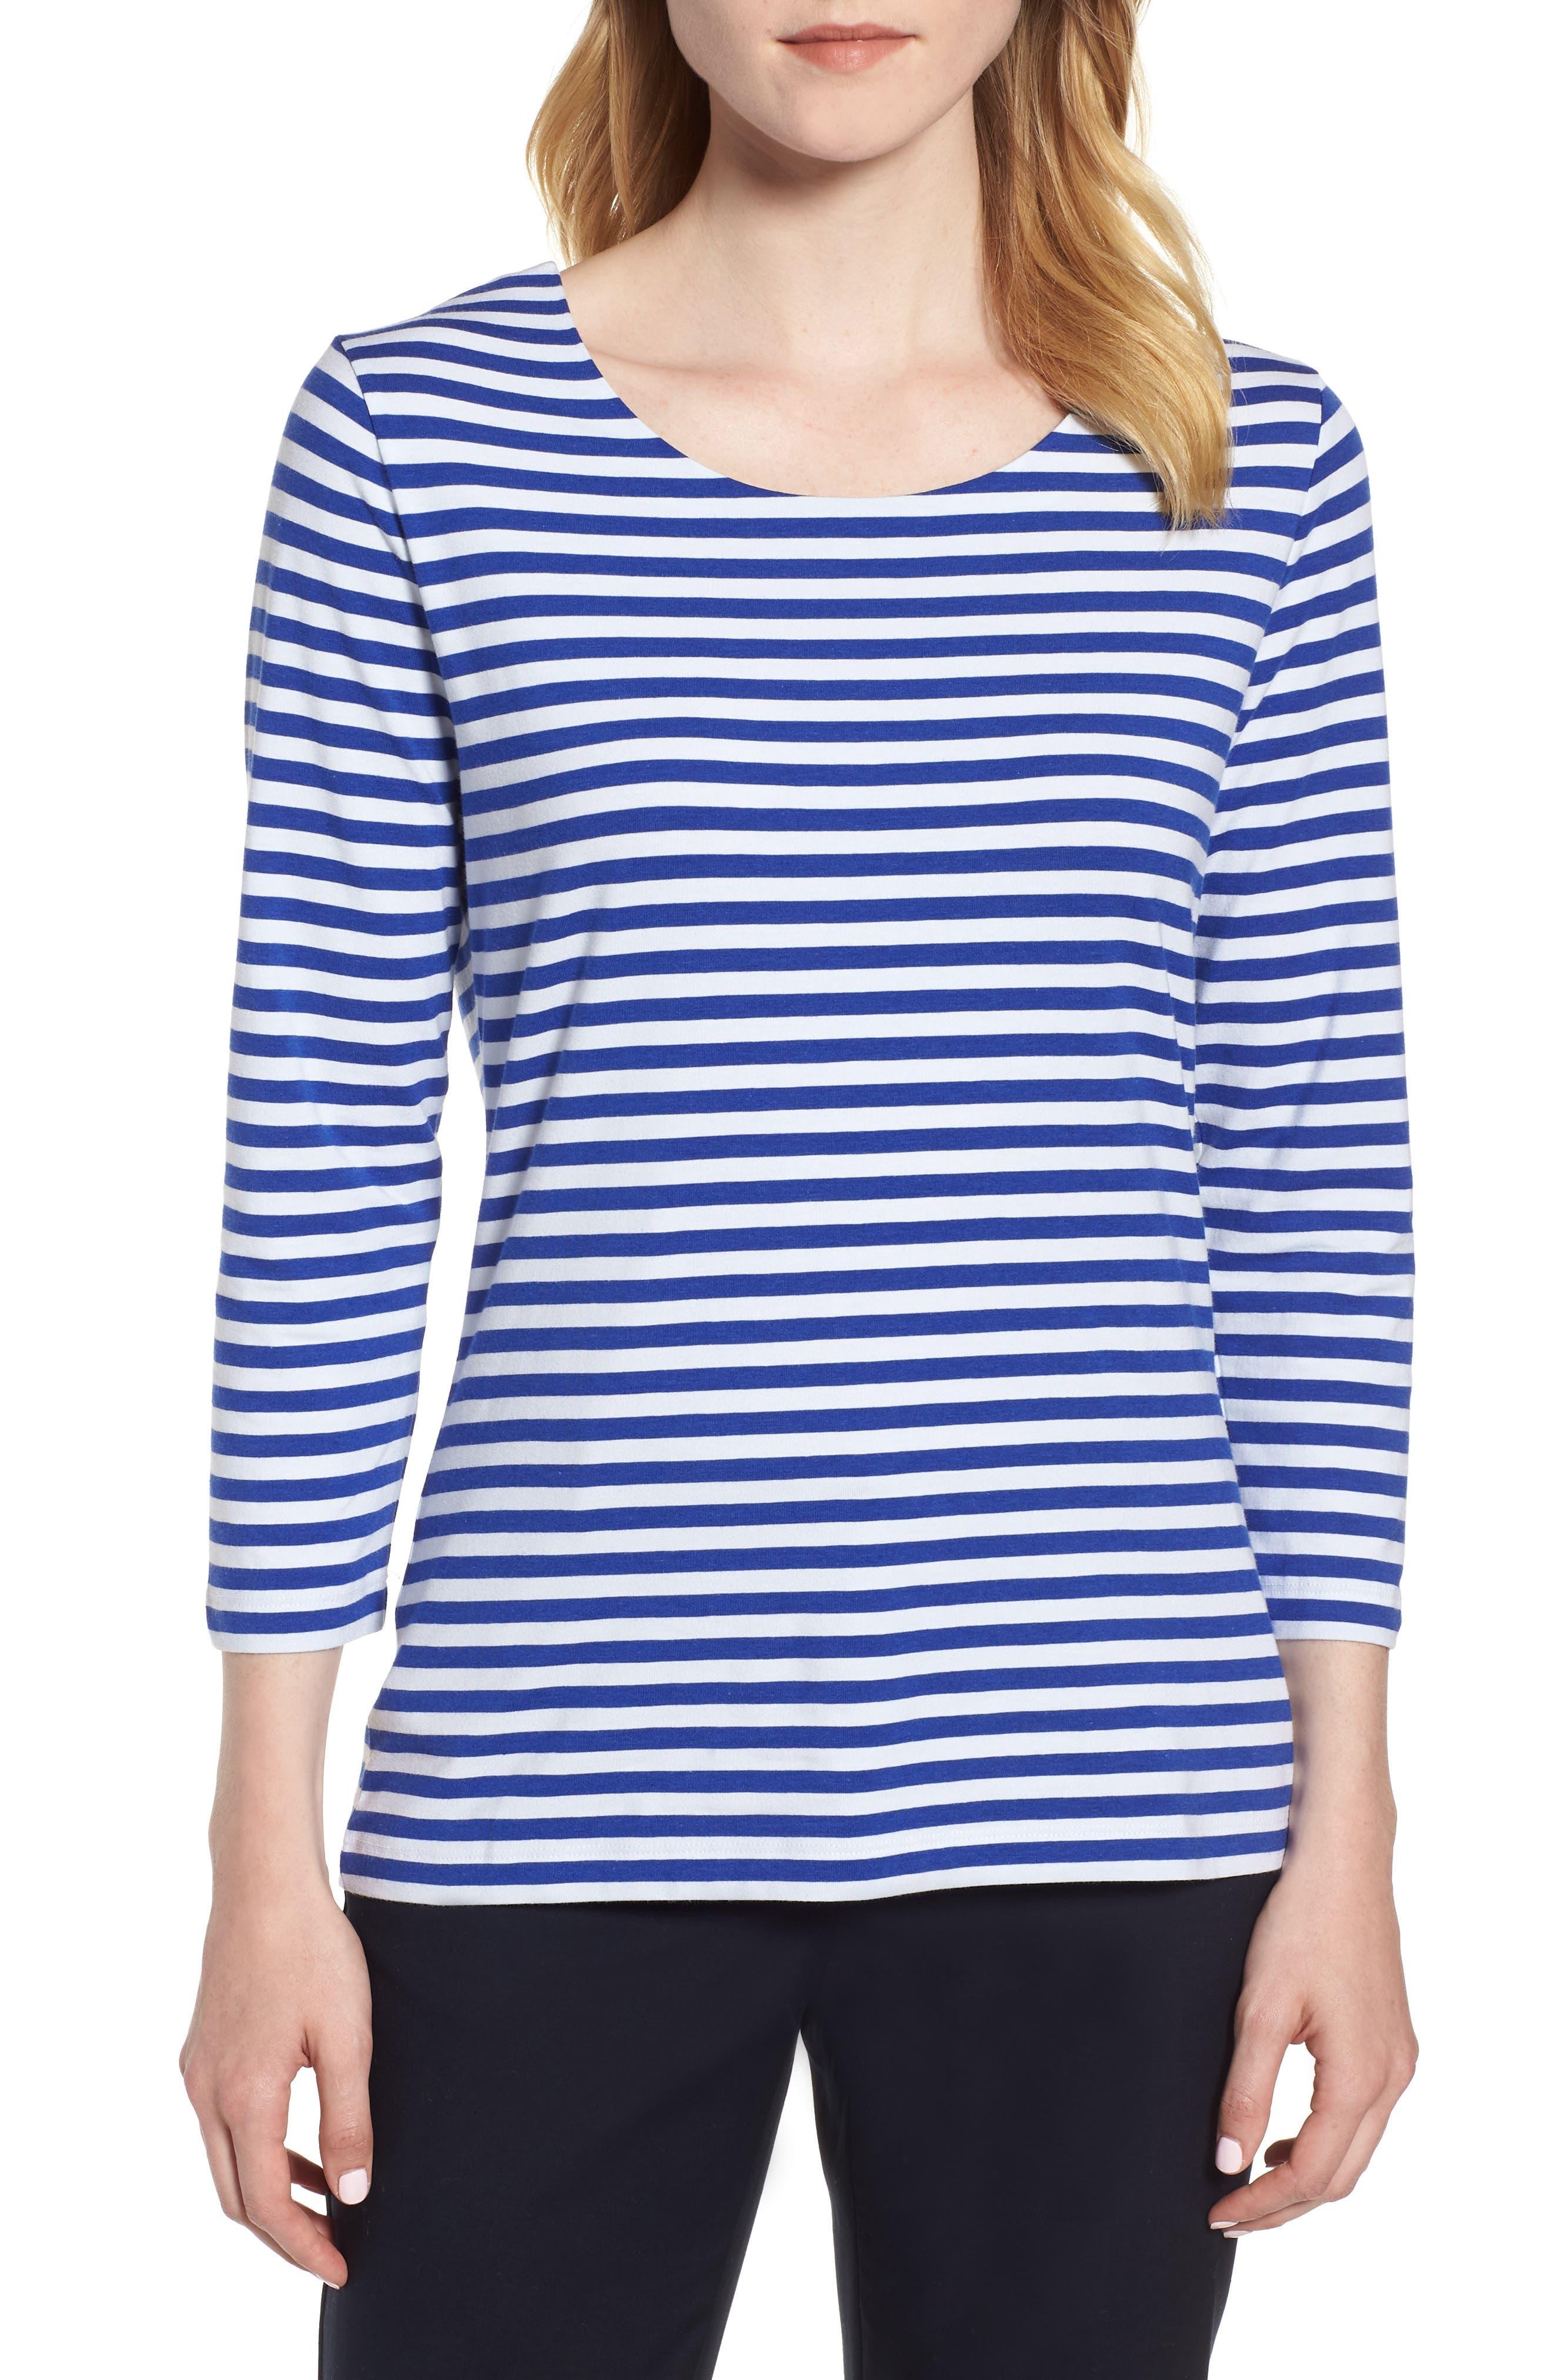 Emmisana Stripe Top,                         Main,                         color, 467